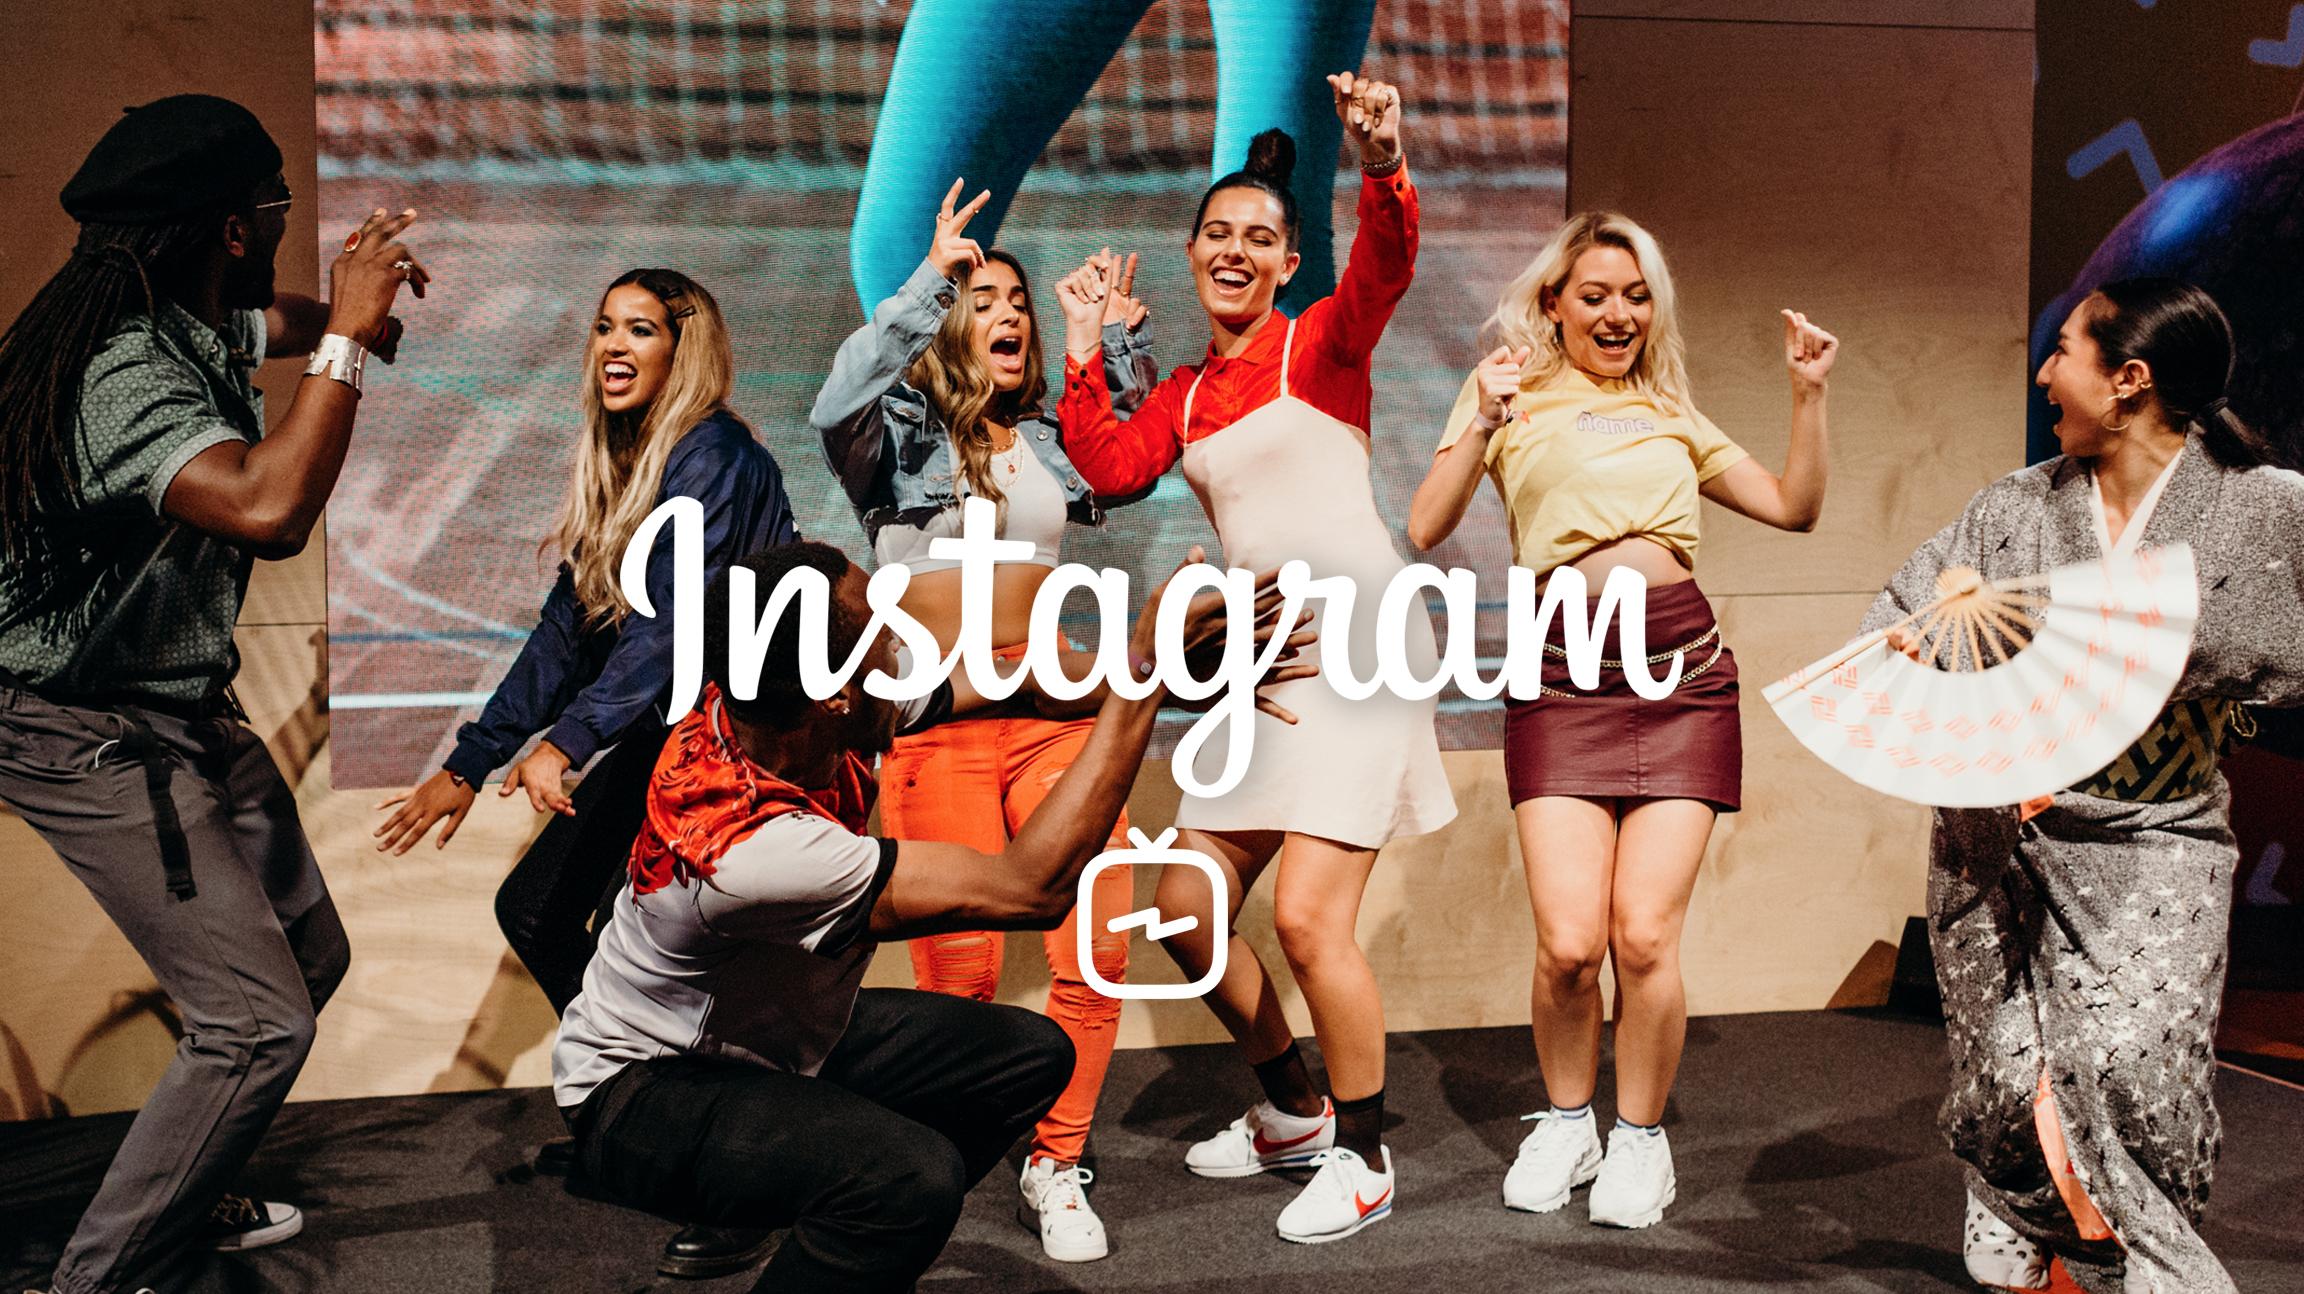 instagram_webthumb.jpg